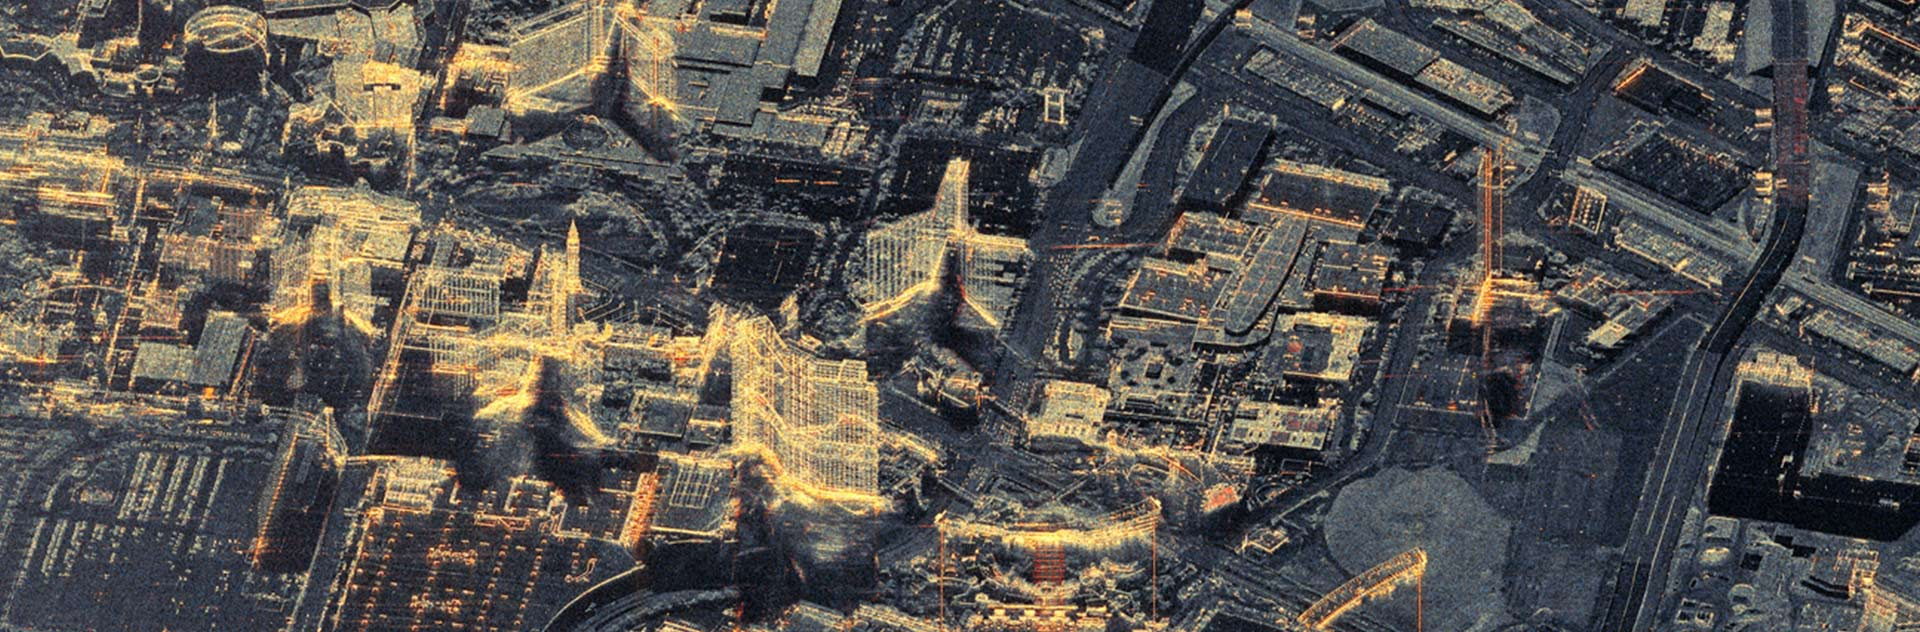 TerraSAR-X Satellite Image - Las Vegas USA